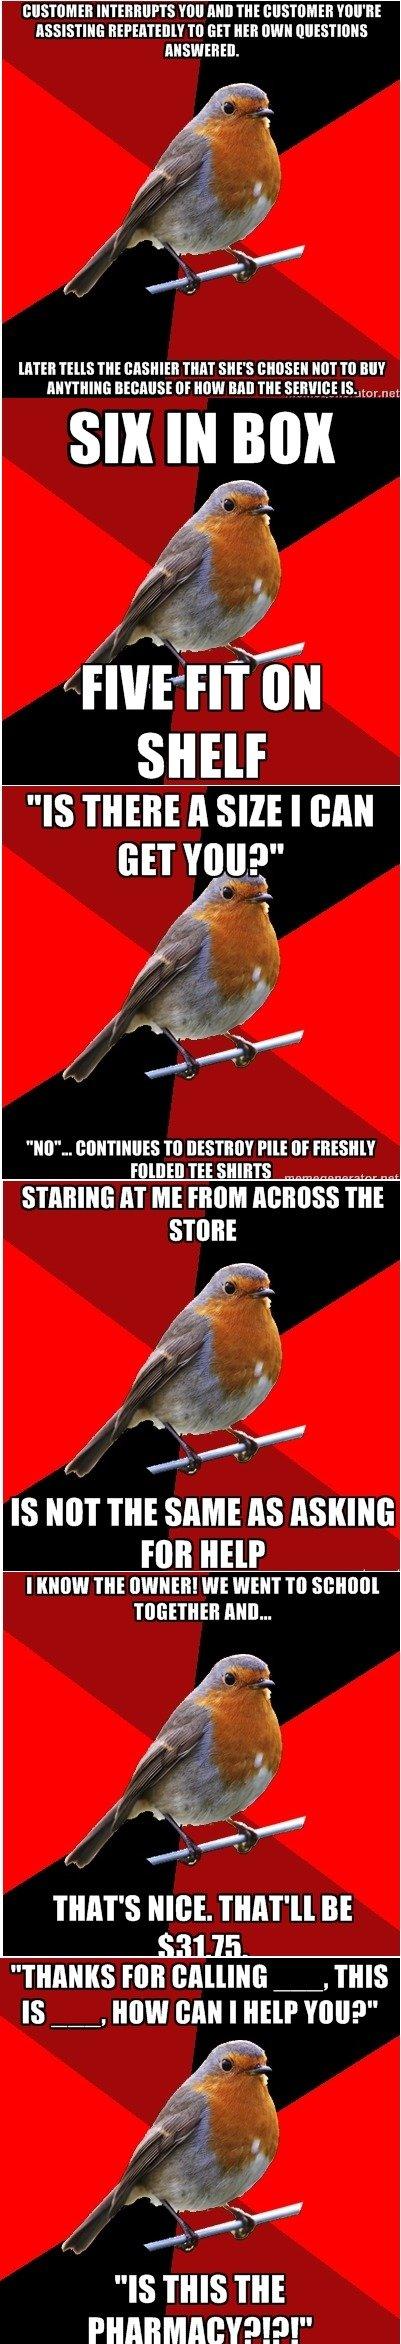 "Retail Robin comp, pt 2. Here's the first one: funnyjunk.com/funny_pictures/3912163/Retail+Robin+Comp+pt1/. INN AHI] m I' VIII' HE IIEK' "" TI] EH NEH WIN BITTEH"